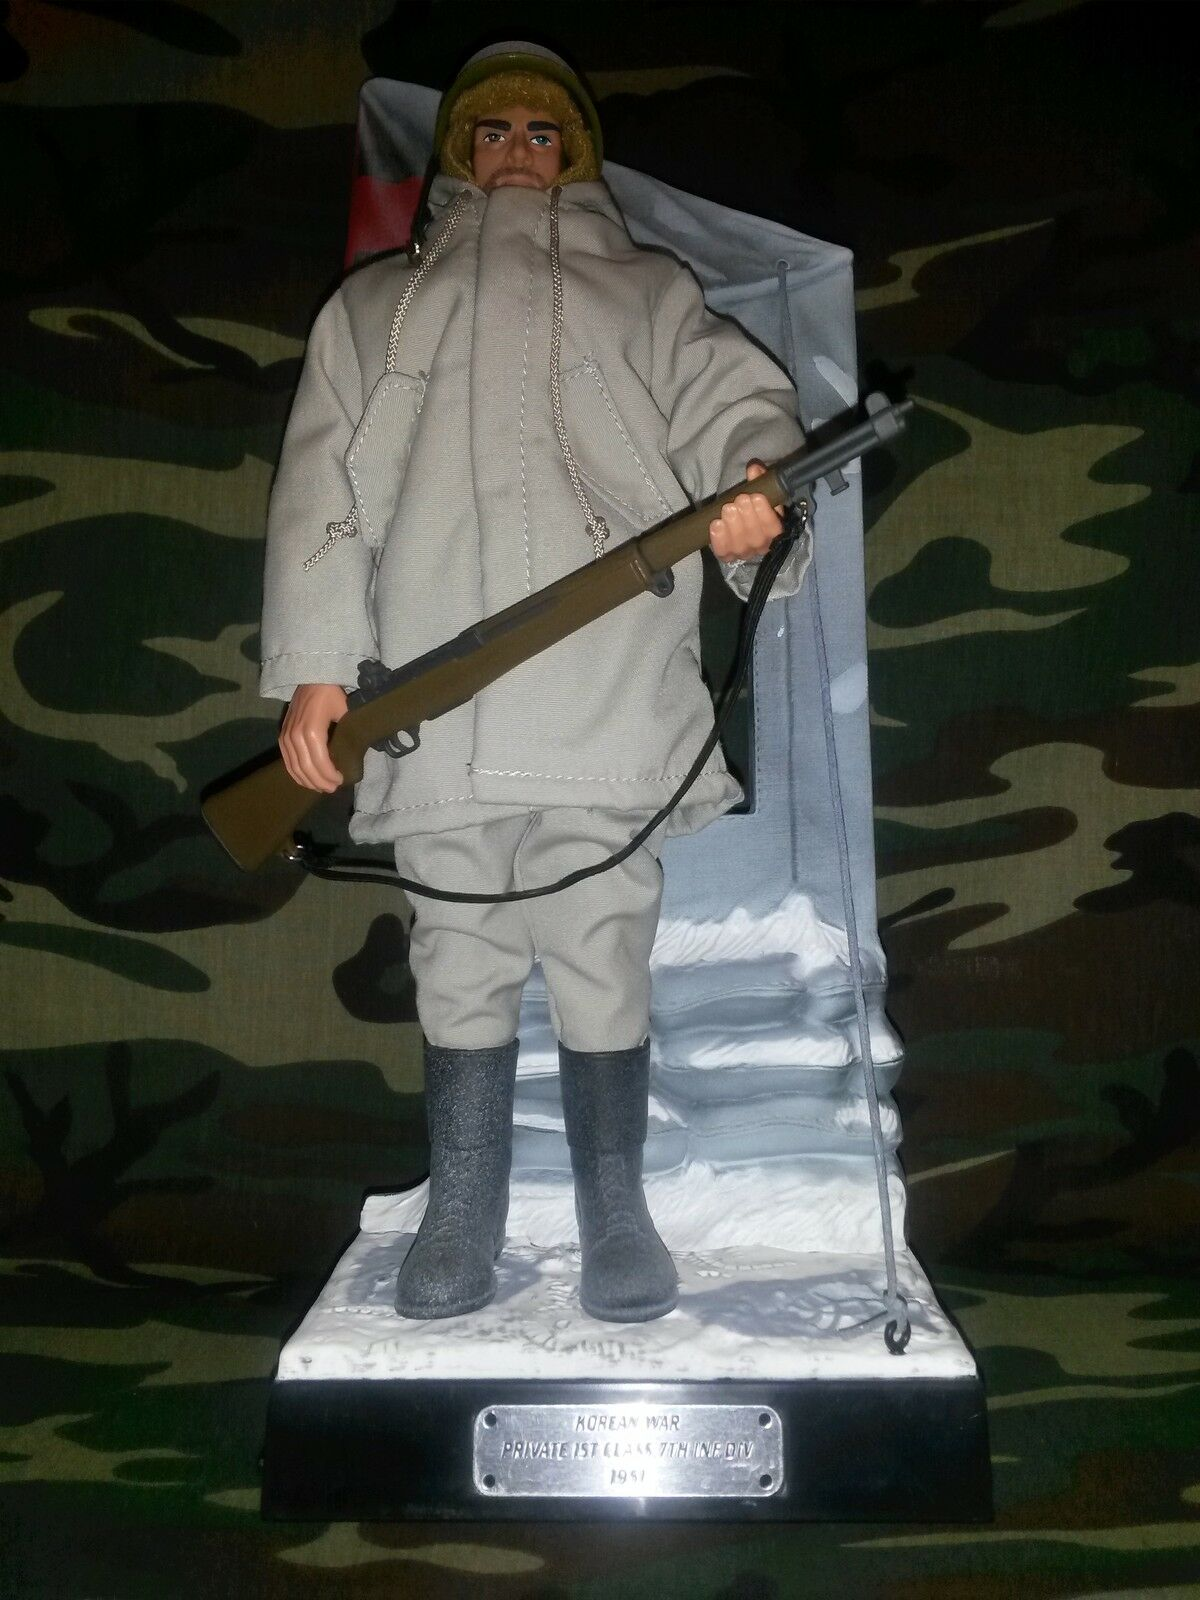 GI JOE MILLENNIUM SERIES COLLECTION KOREAN WAR US ARMY 7TH INF DIV 1951 HASBRO